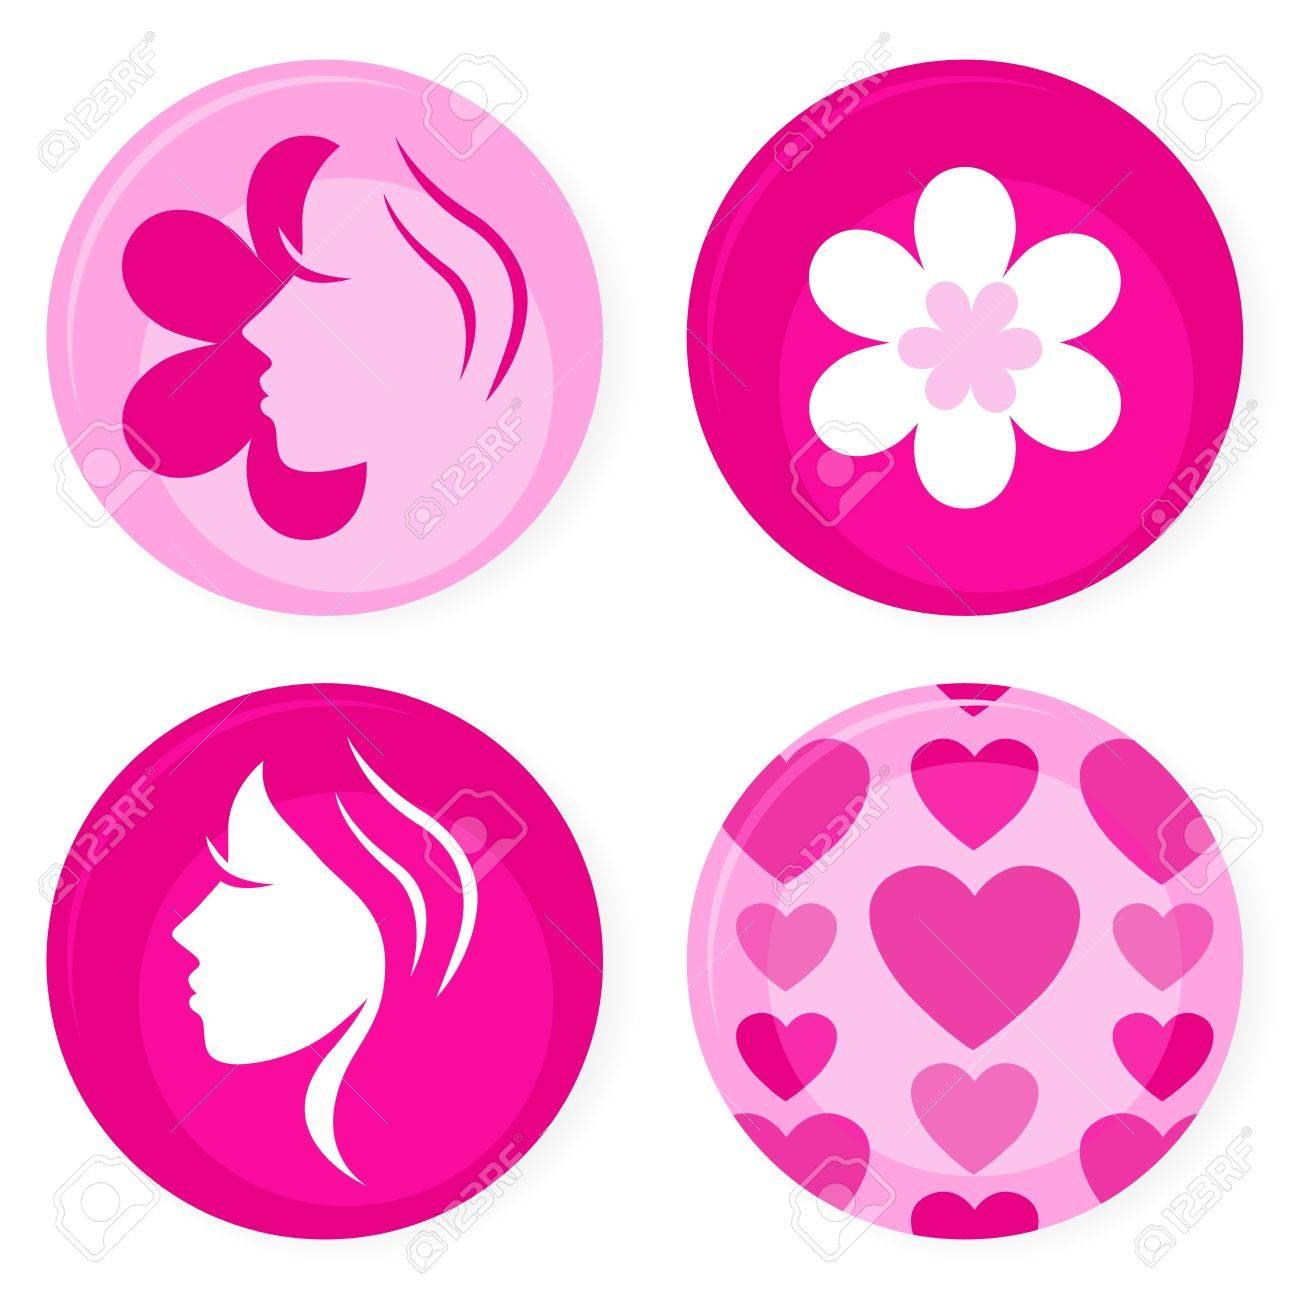 Pink femine symbols or badges. Vector Illustration. Stock Vector - 12162870